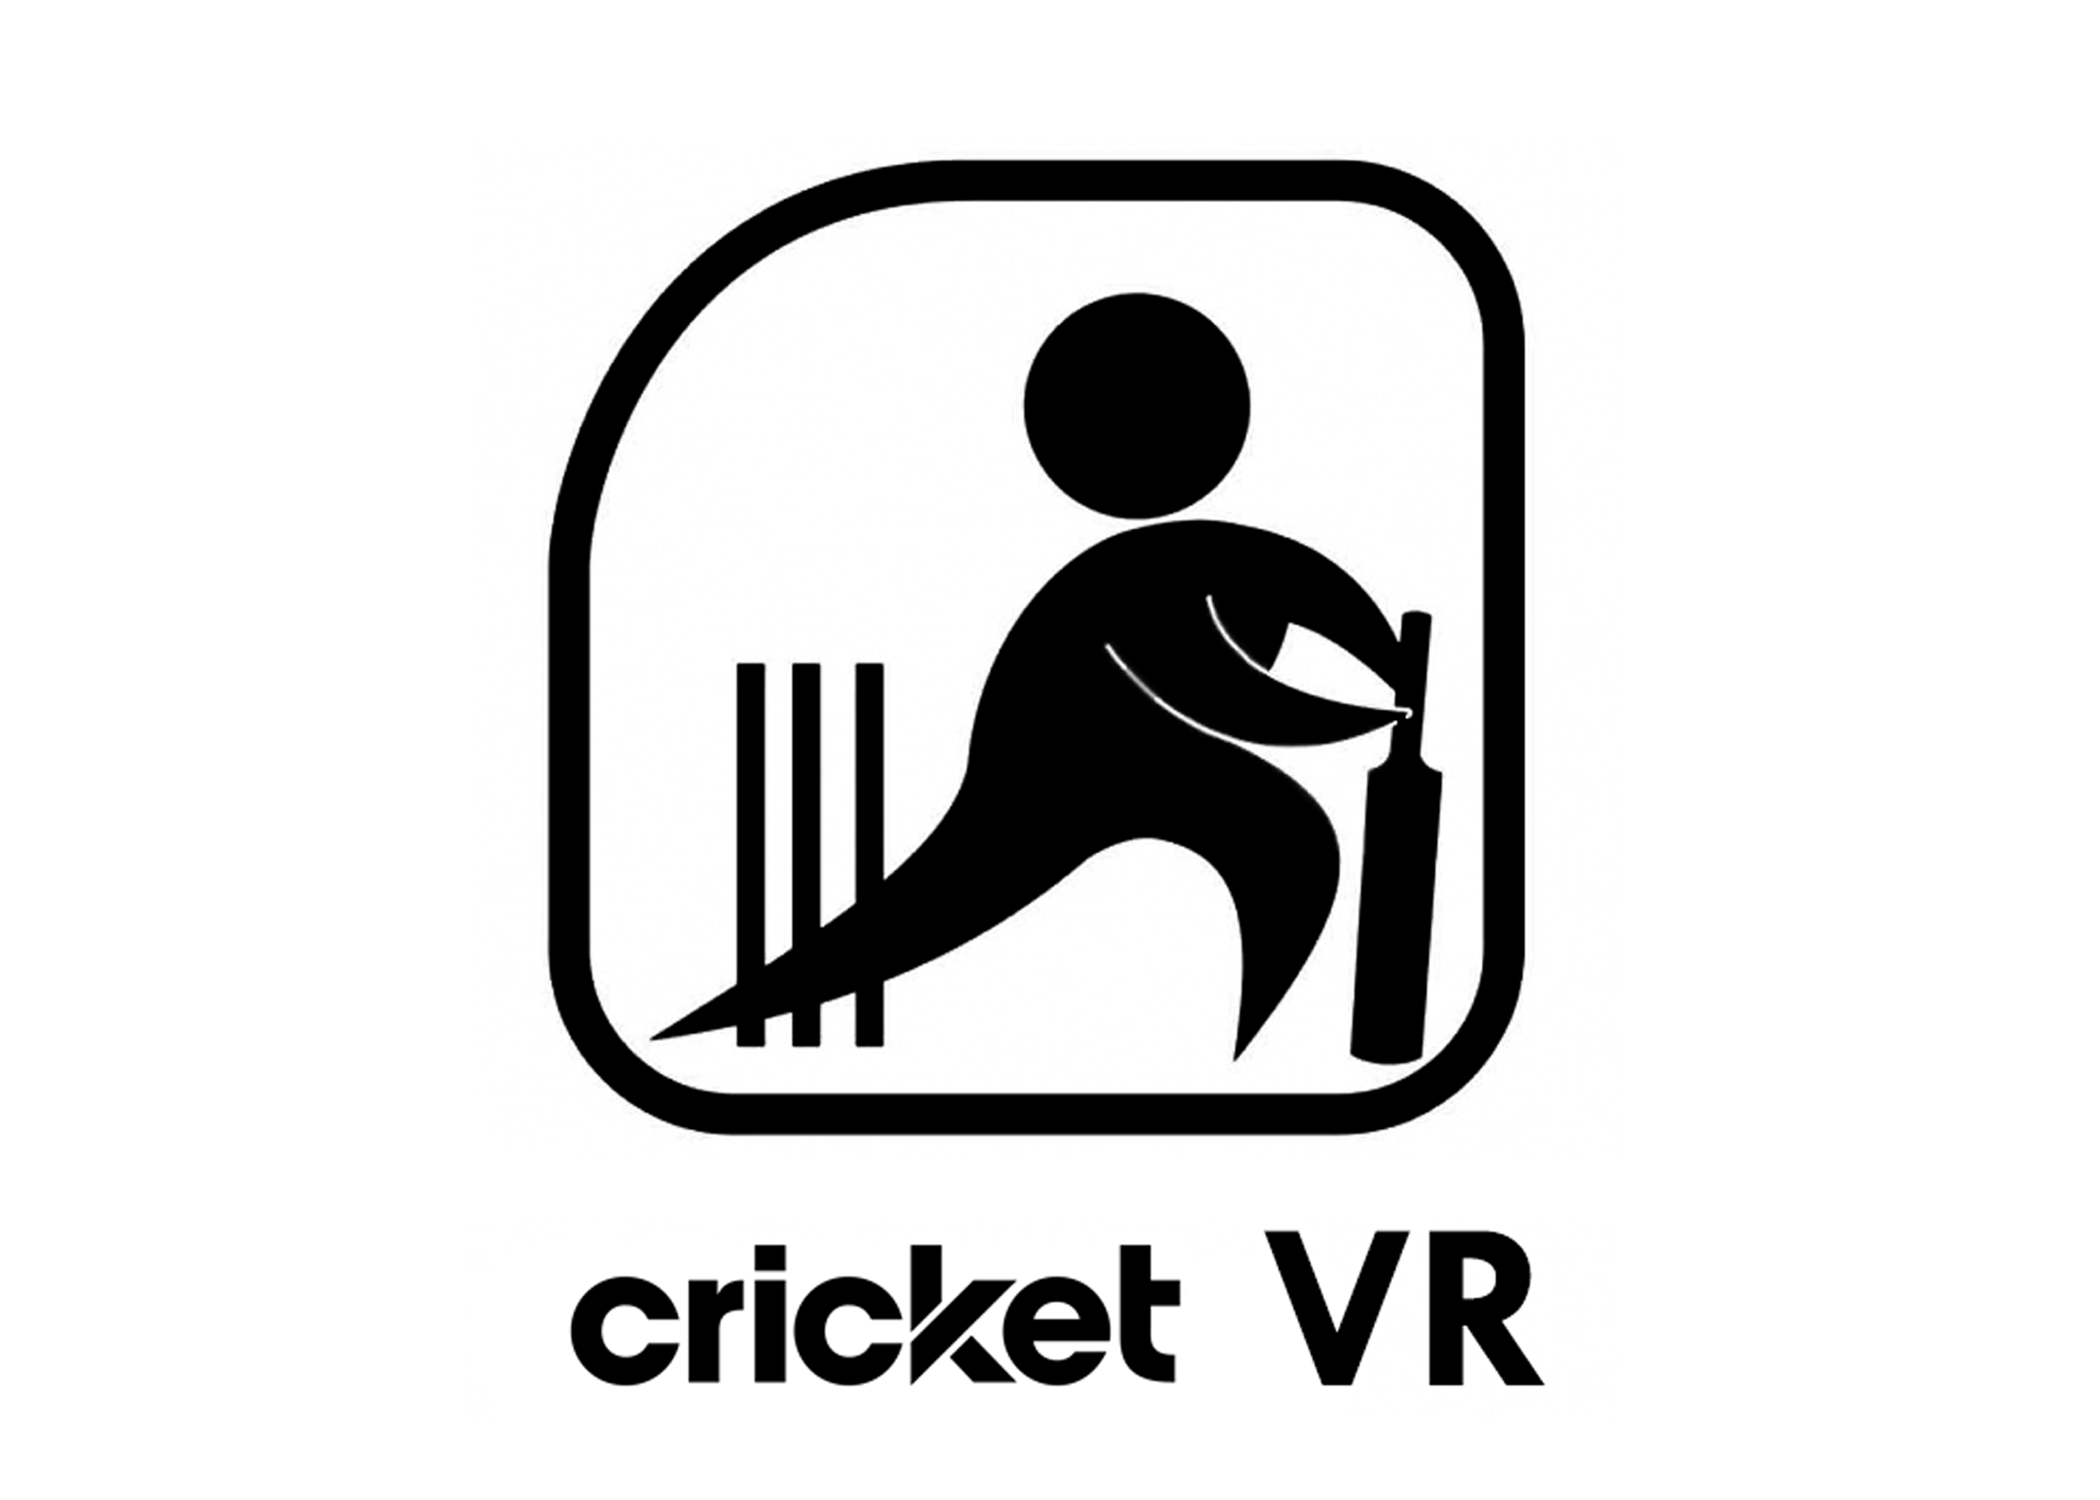 Cricket VR.png